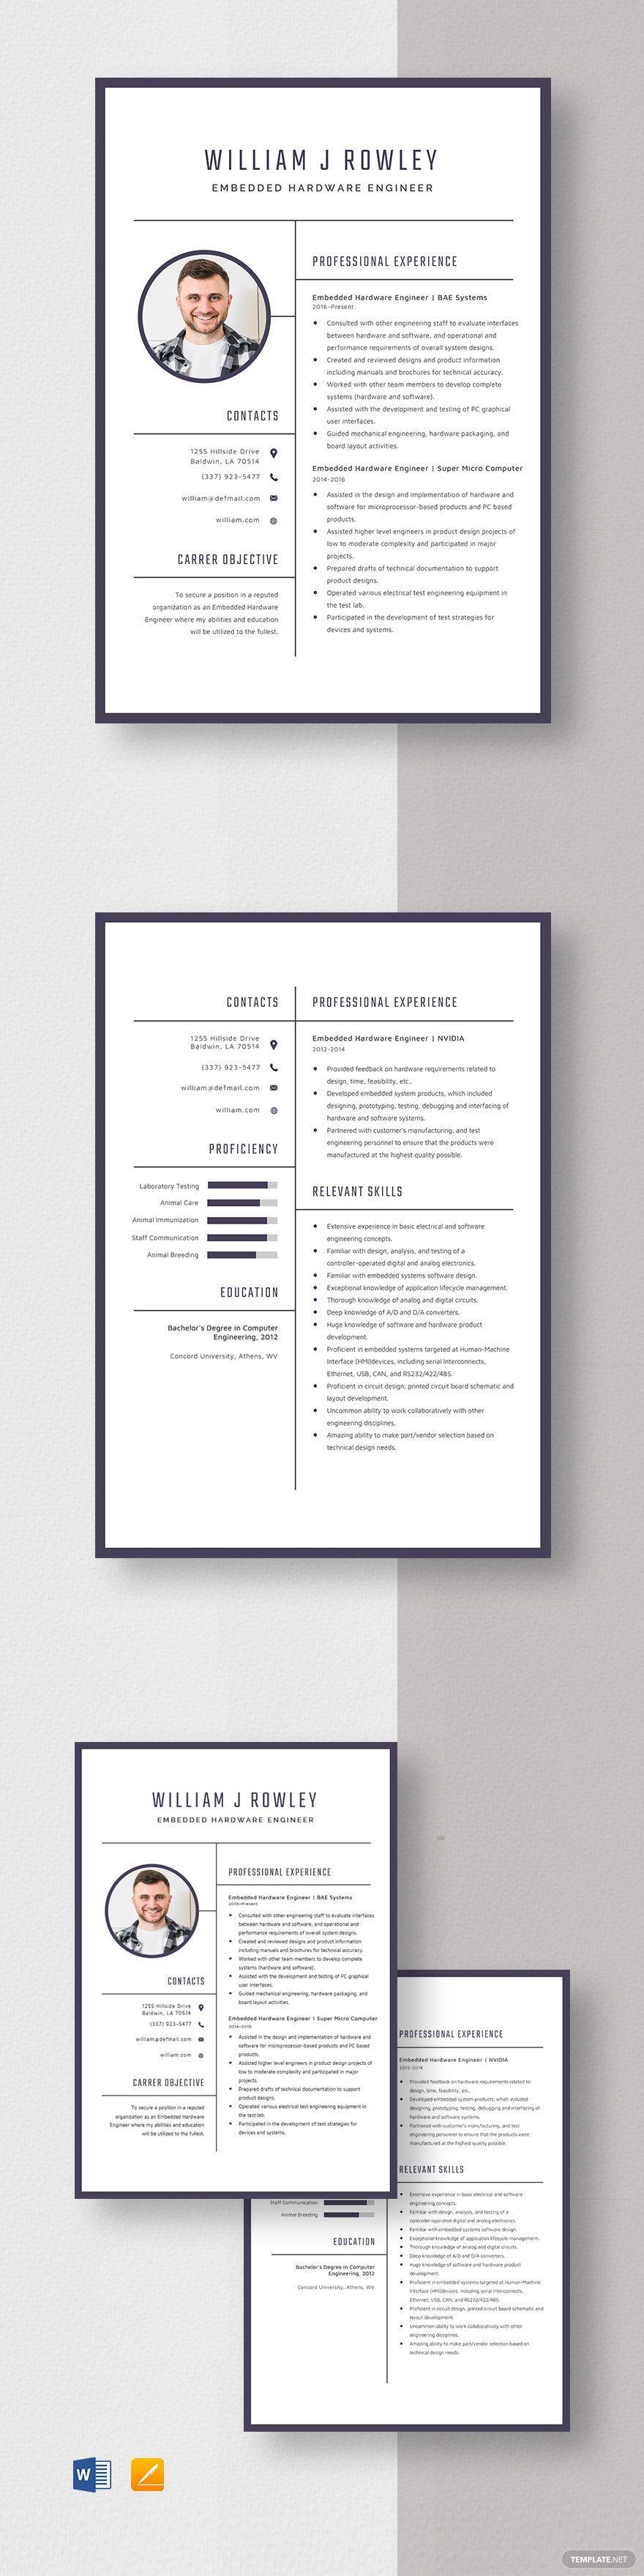 Embedded hardware engineer resume template in 2020